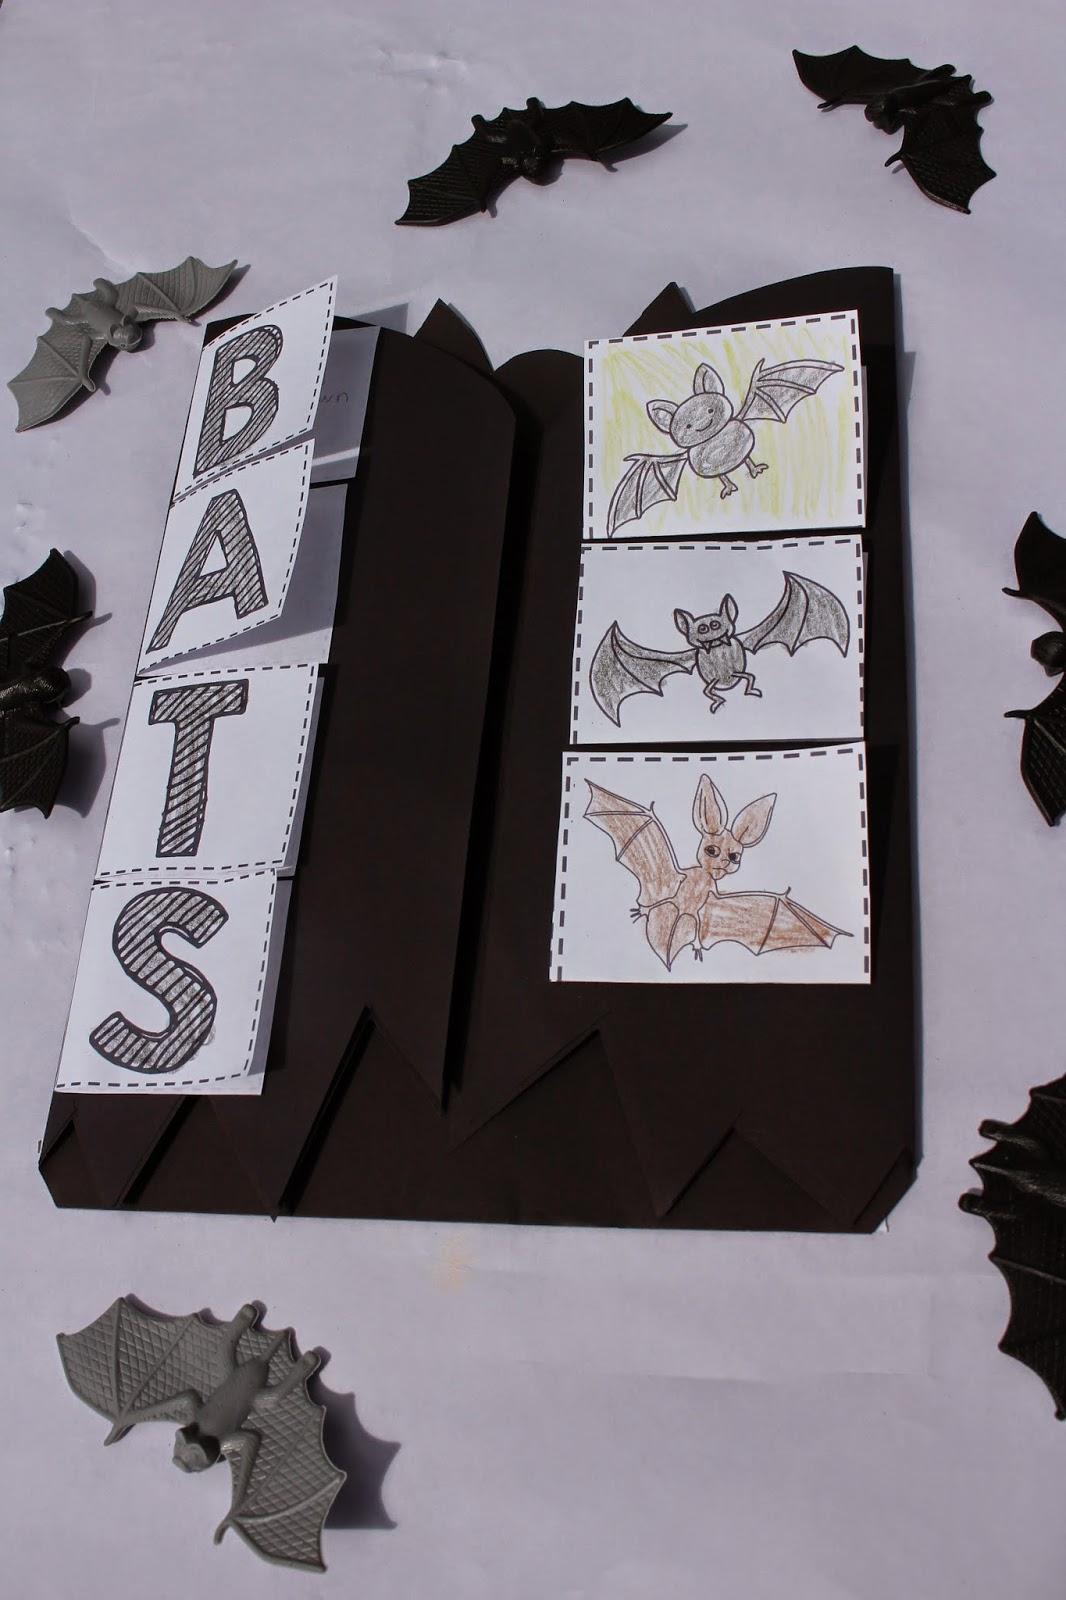 http://www.teacherspayteachers.com/Product/Bat-Science-Interactive-Activities-1482271